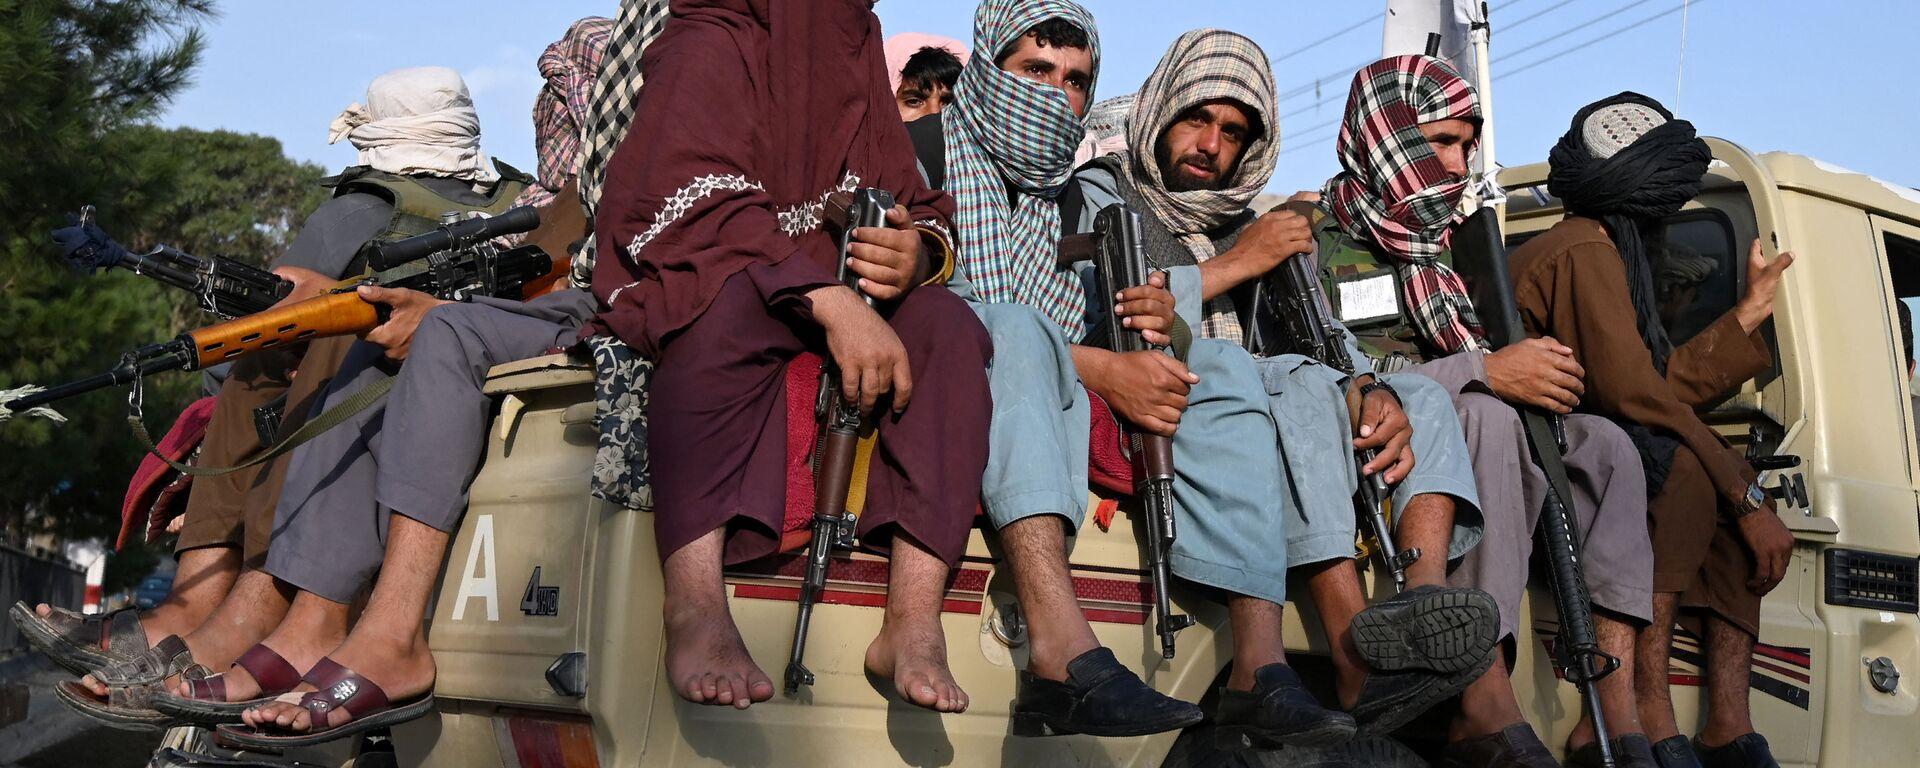 Боевики движения Талибан* патрулируют улицы в Кабуле, Афганистан - Sputnik Узбекистан, 1920, 21.09.2021